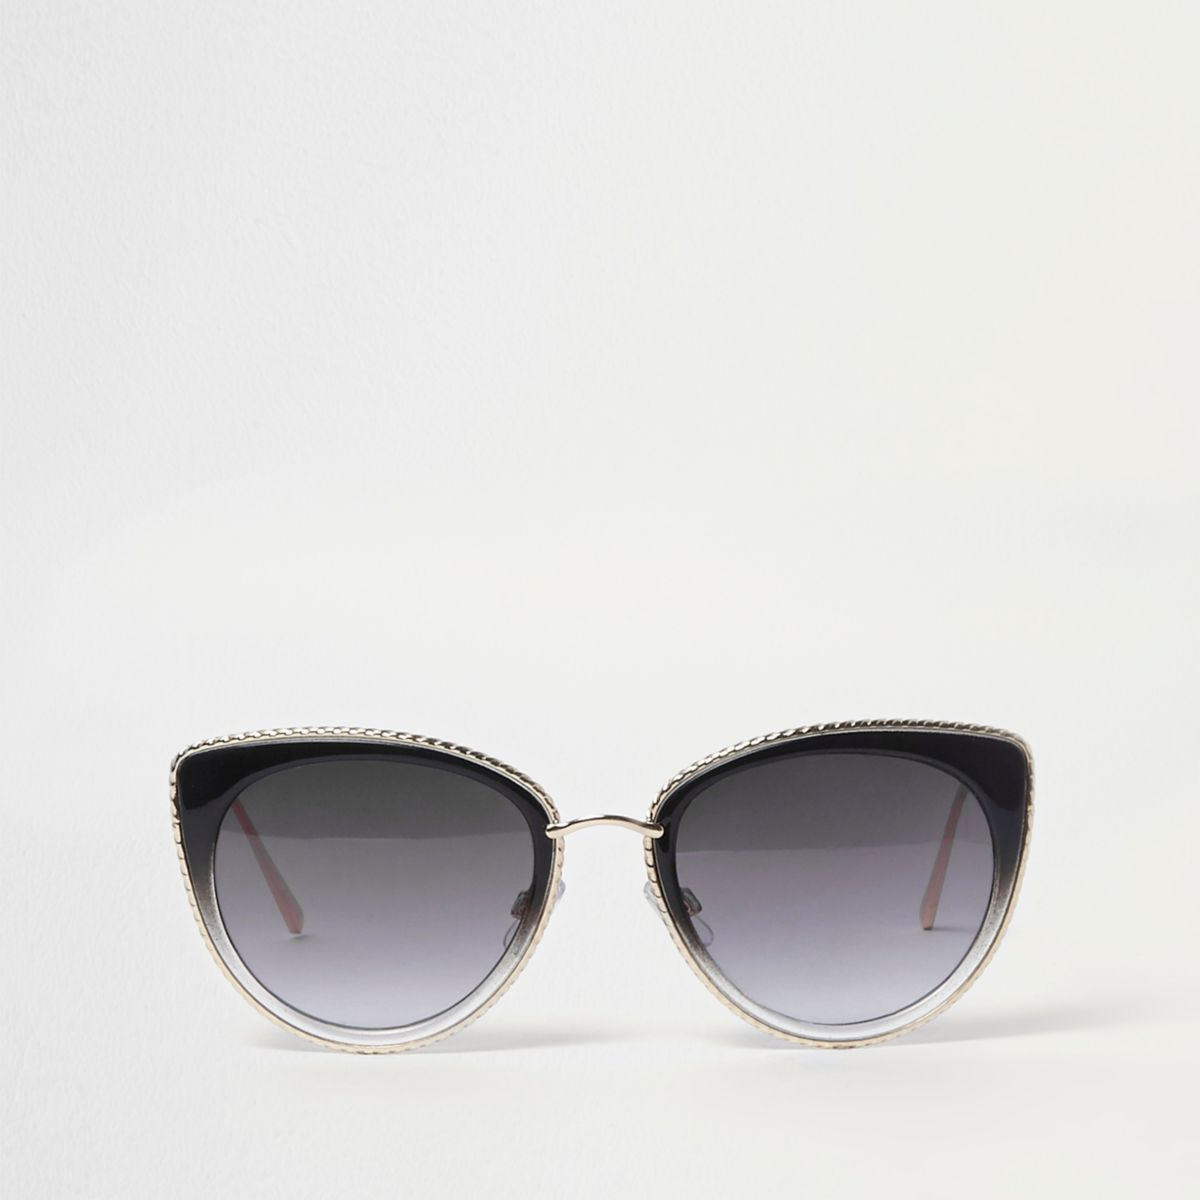 Black cat eye gold tone trim sunglasses